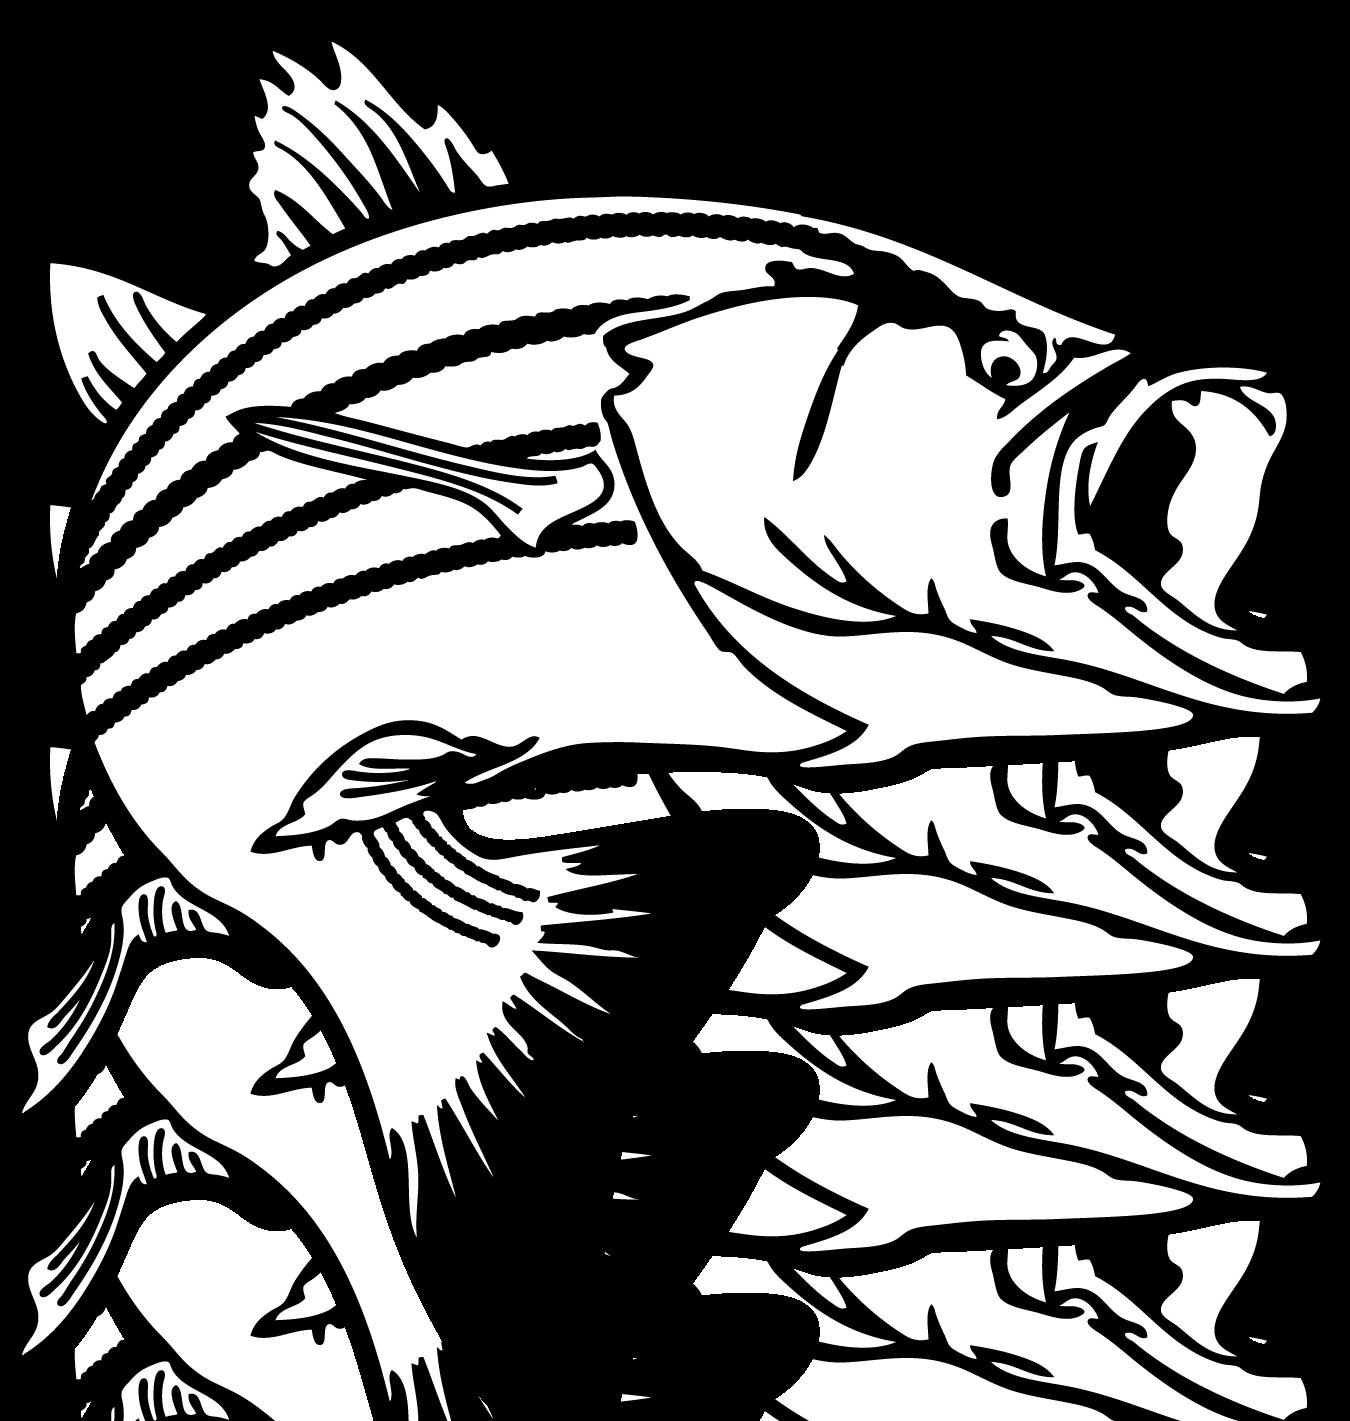 1350x1421 Salmon Rainbow Trout Clipart Image